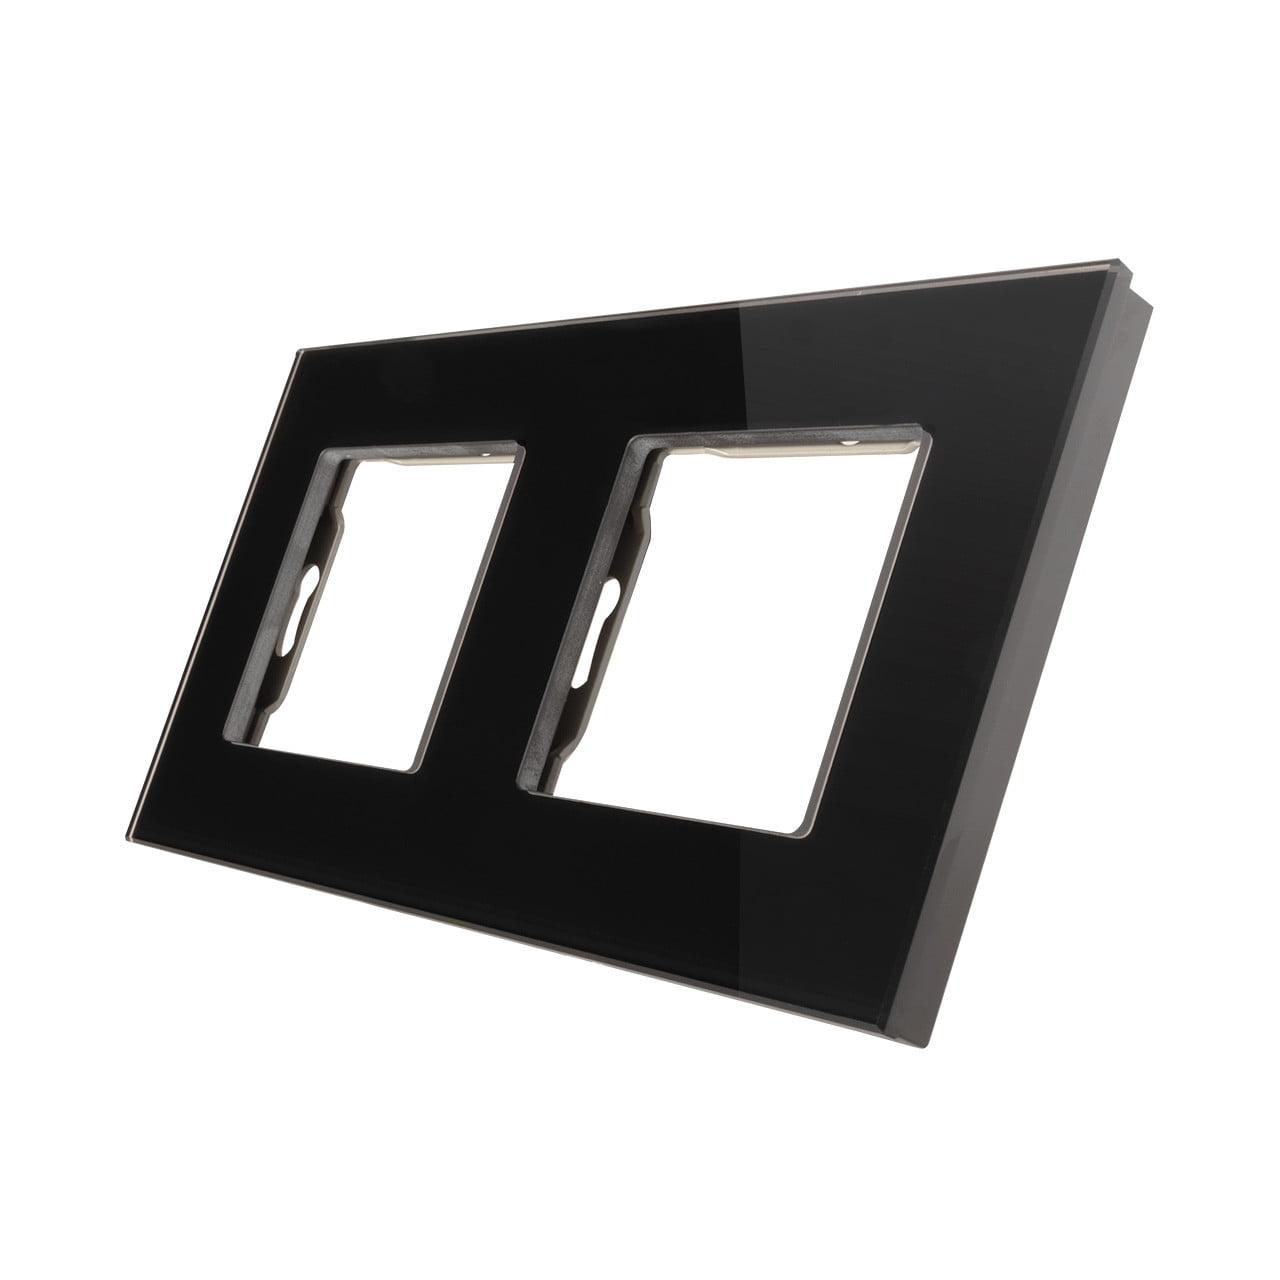 Rama priza dubla din sticla, 4 module, Smart Home